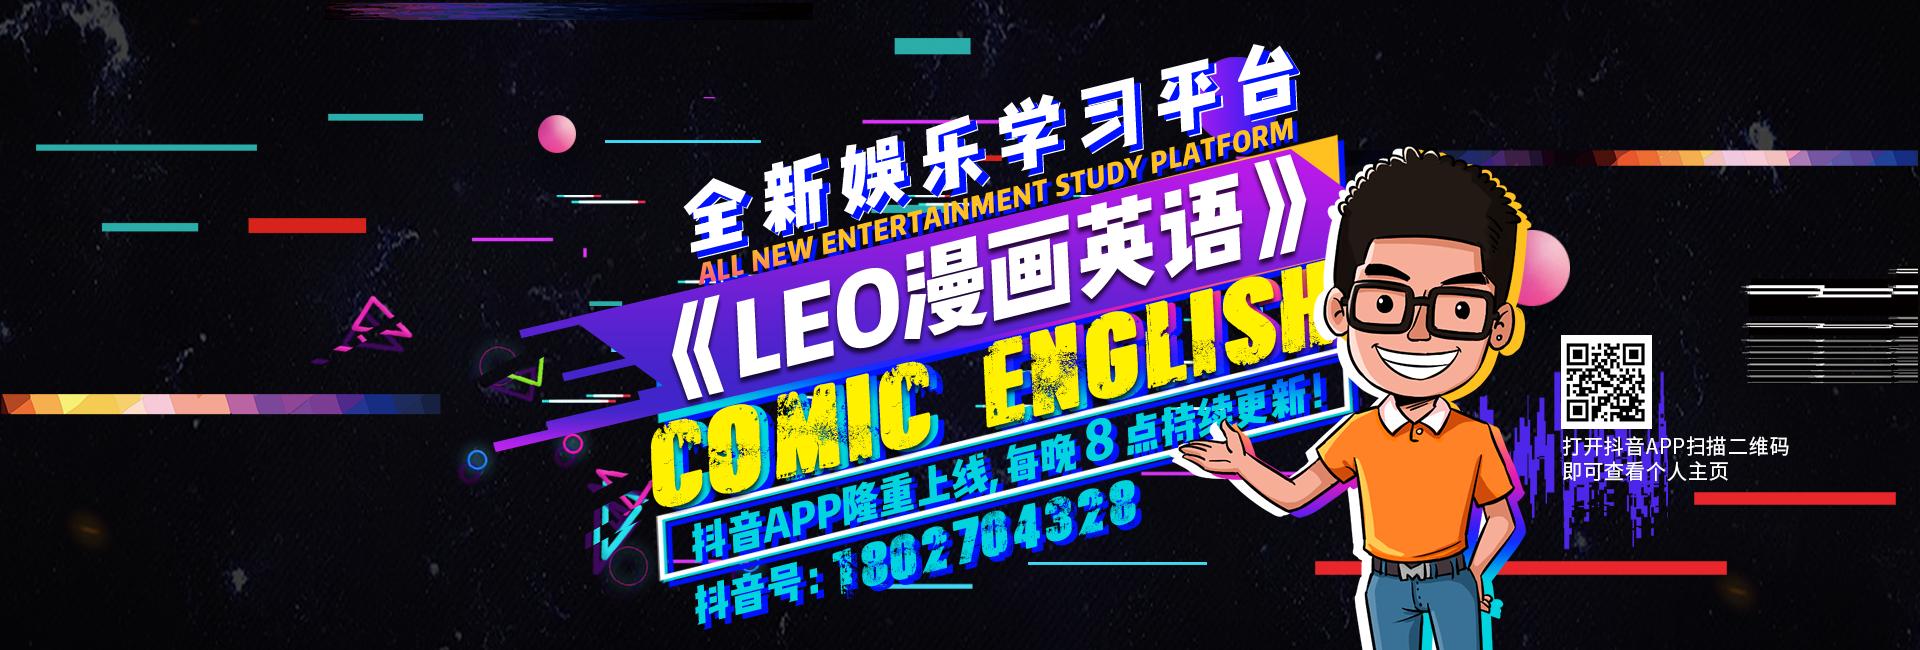 LEO漫画英语